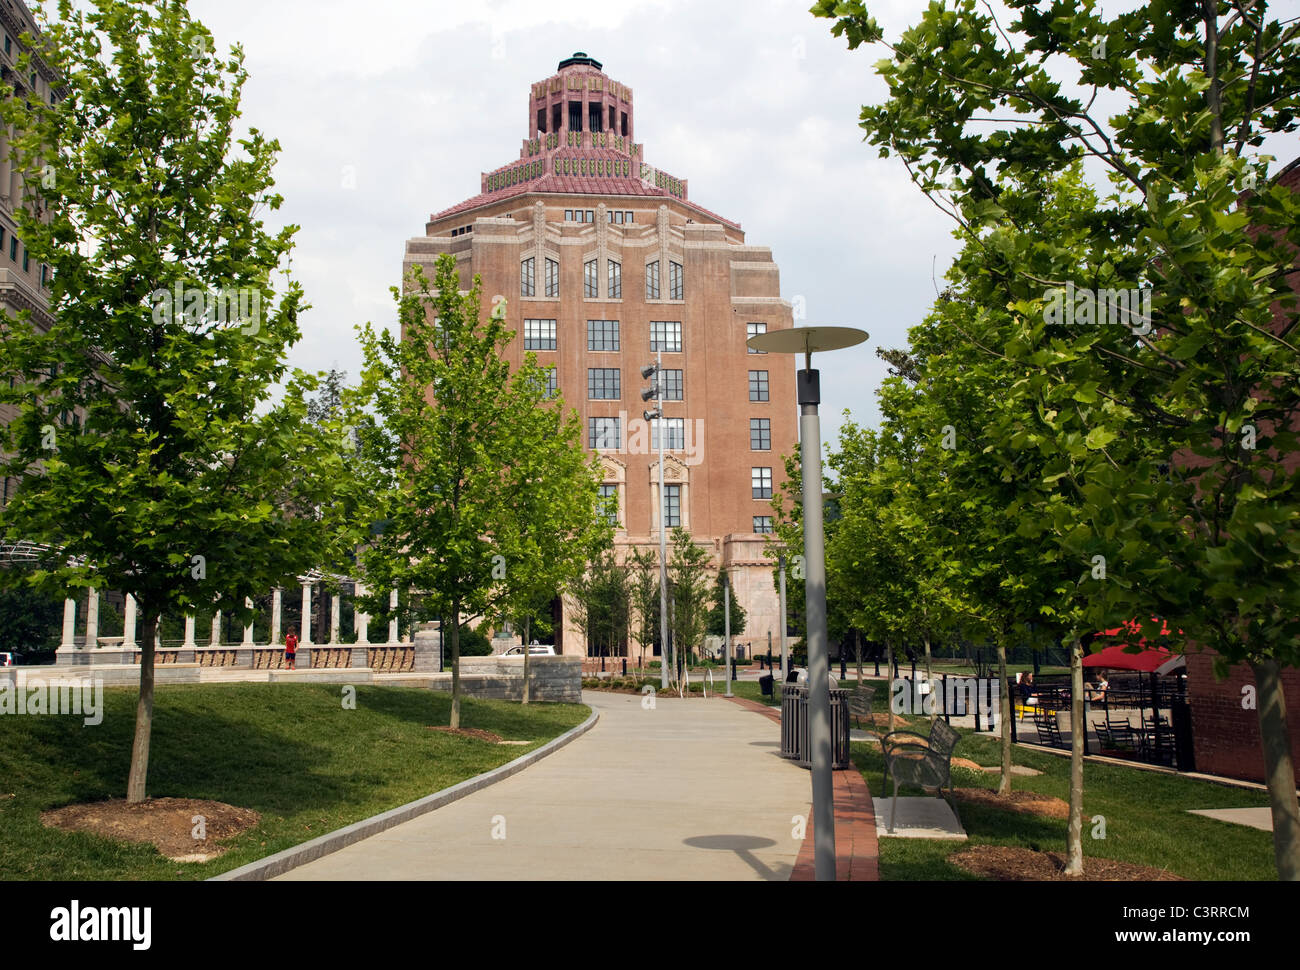 Asheville City Hall - Pack Square - Asheville, North Carolina USA - Stock Image